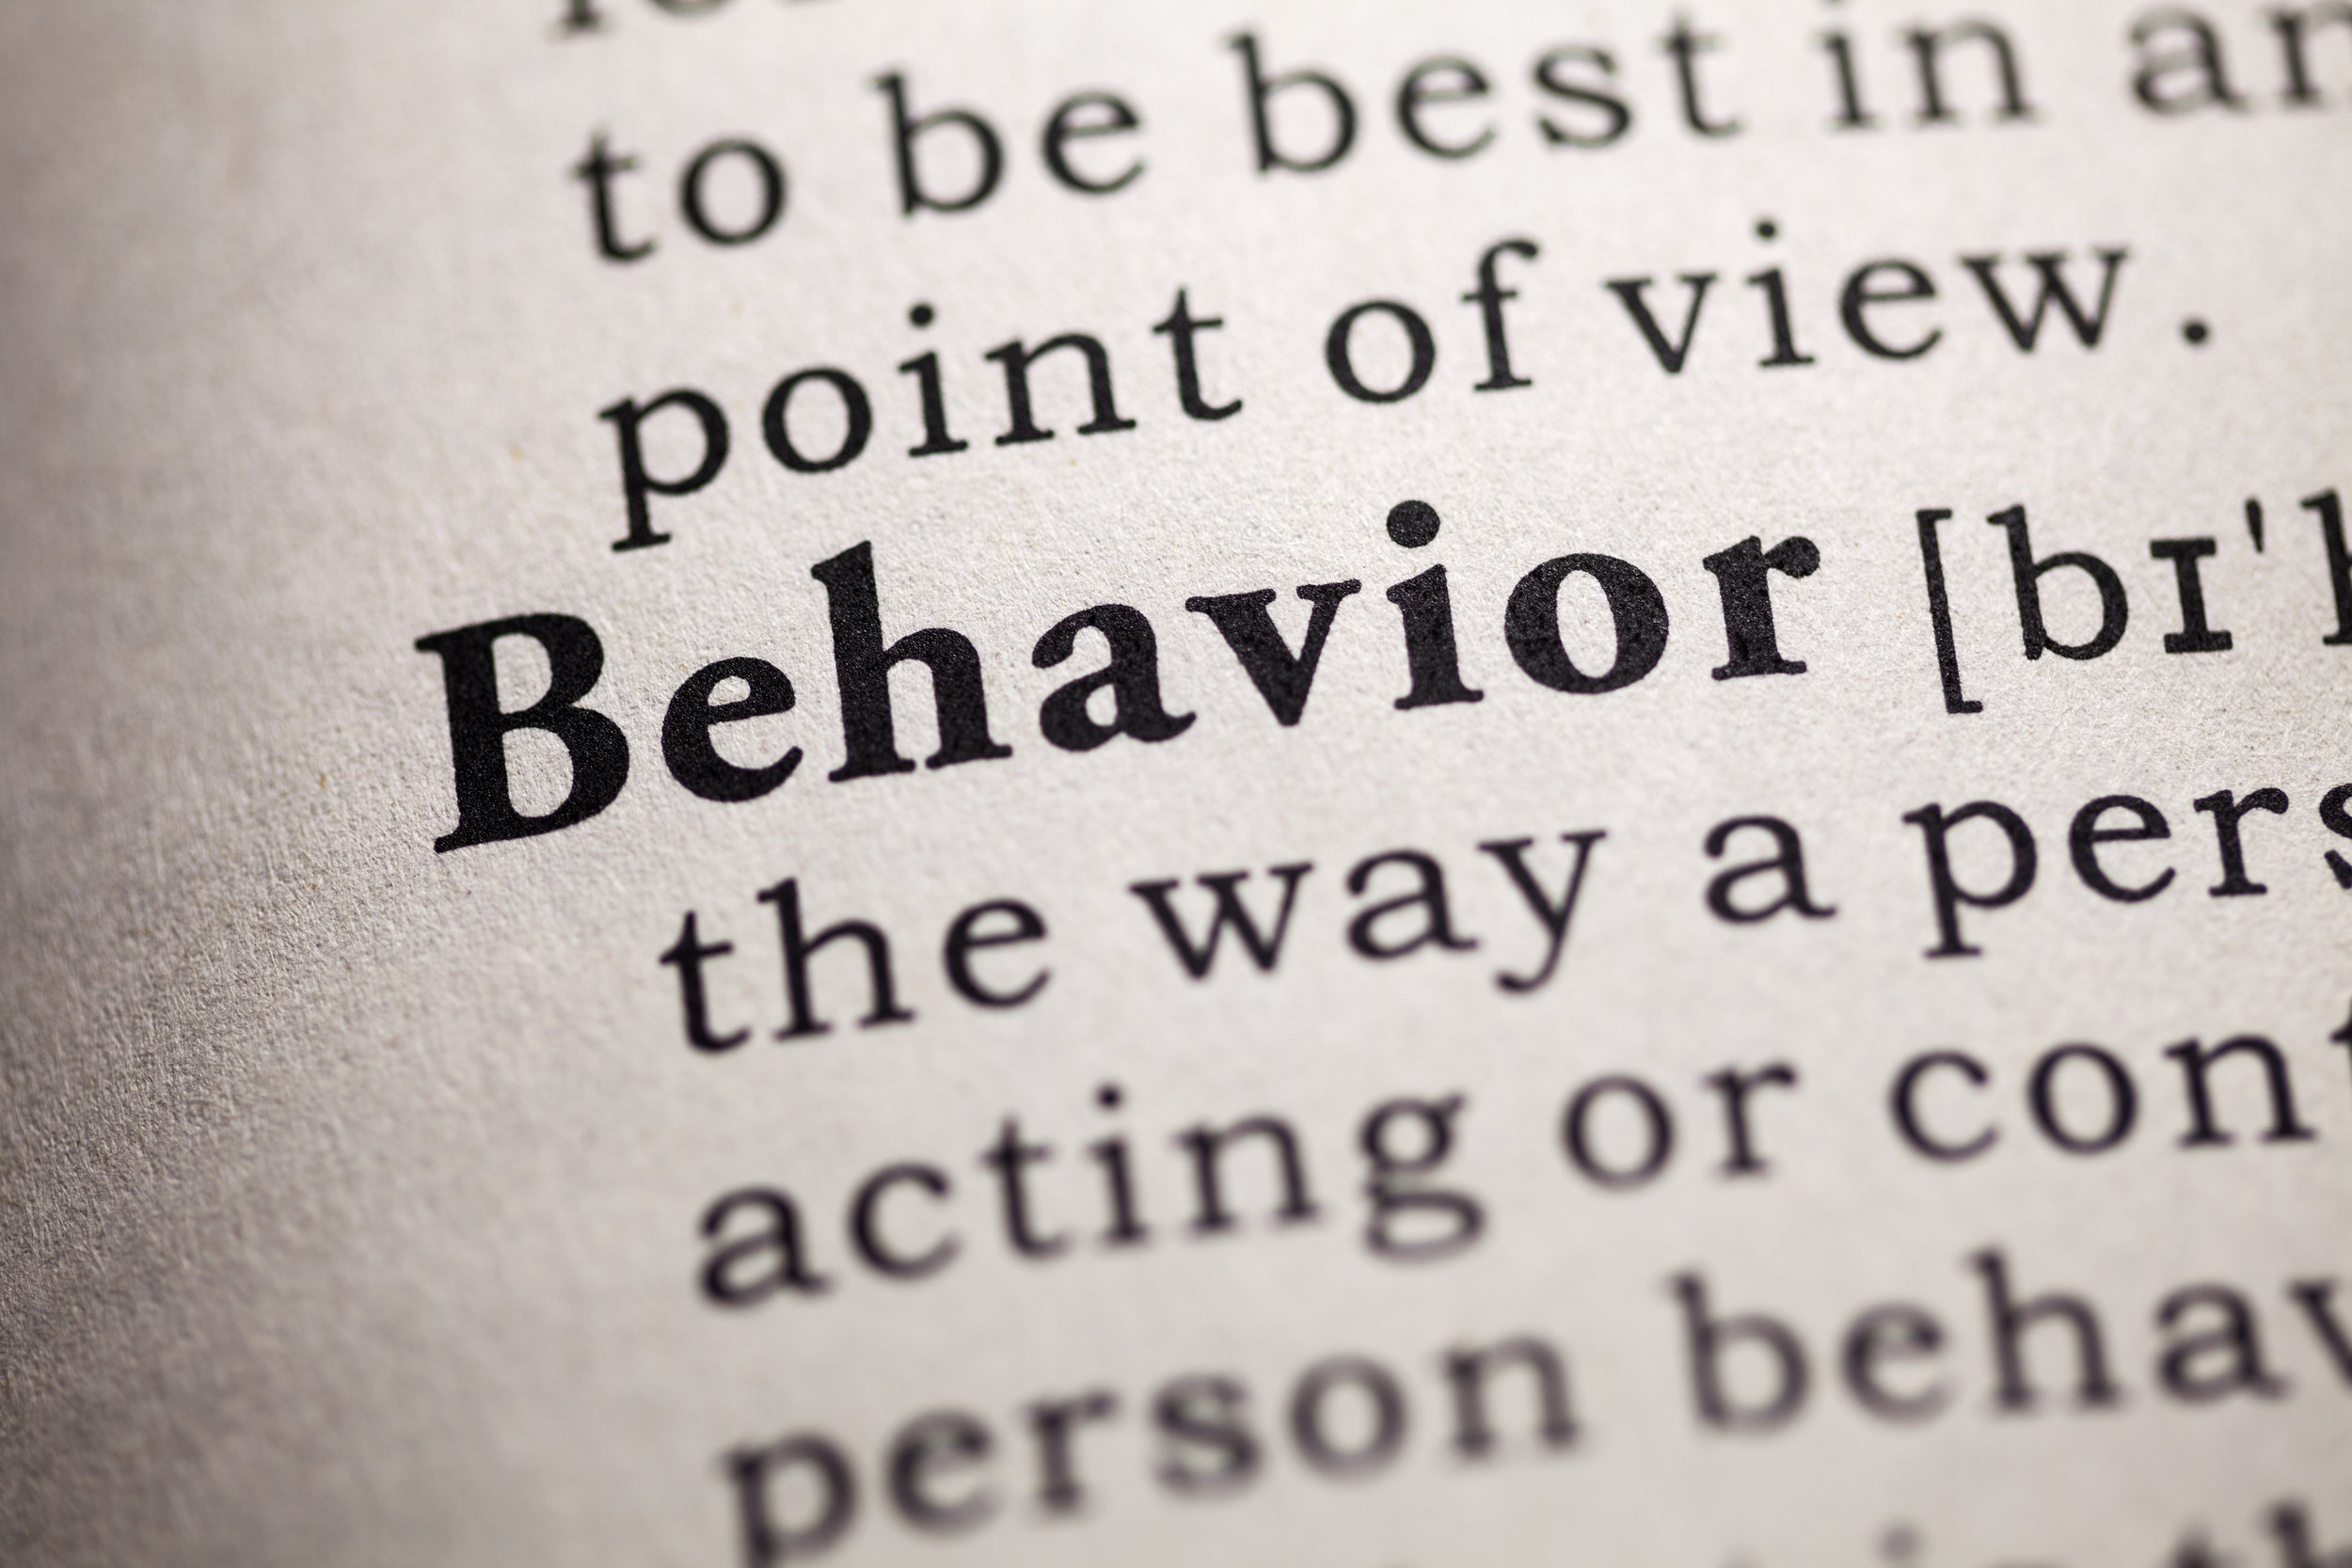 BehaviorAdobeStock_91530335_WM.jpeg